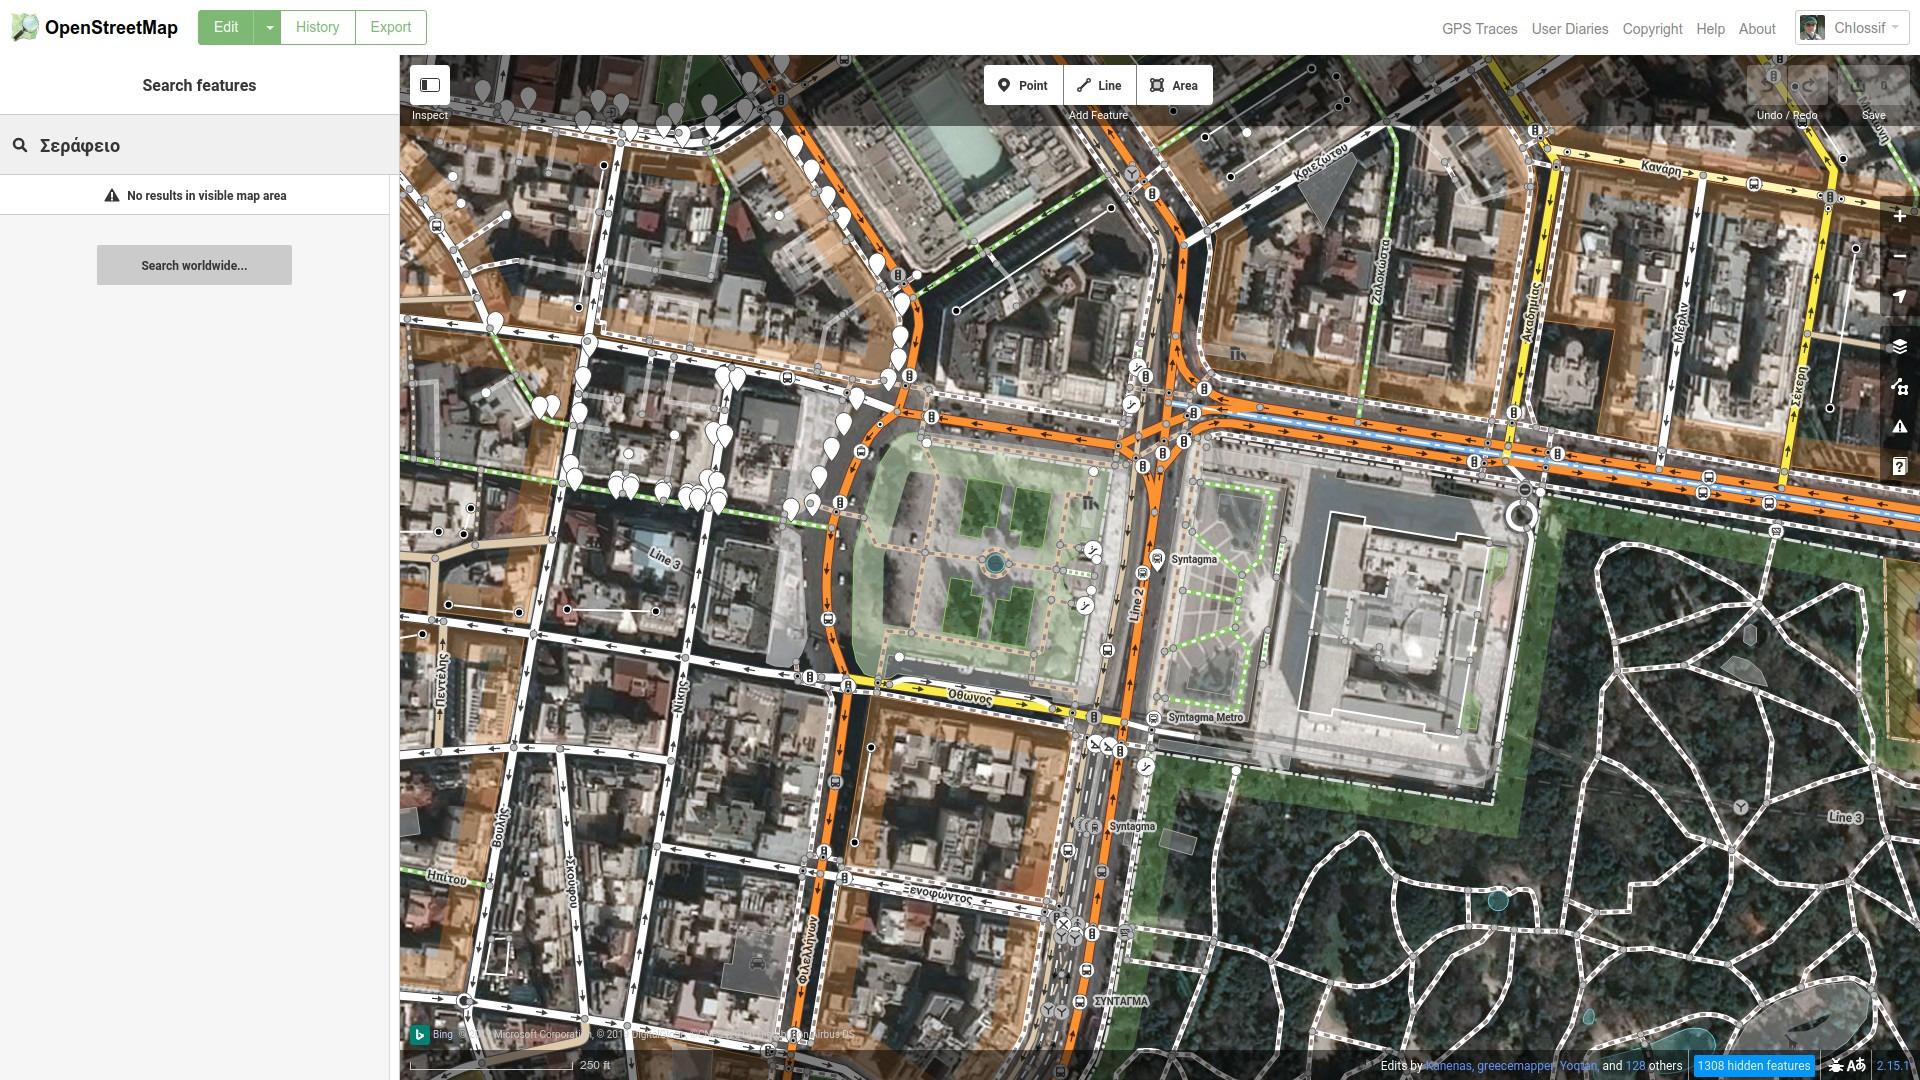 OSM Εστίαση στην περιοχή του Σεράφειου